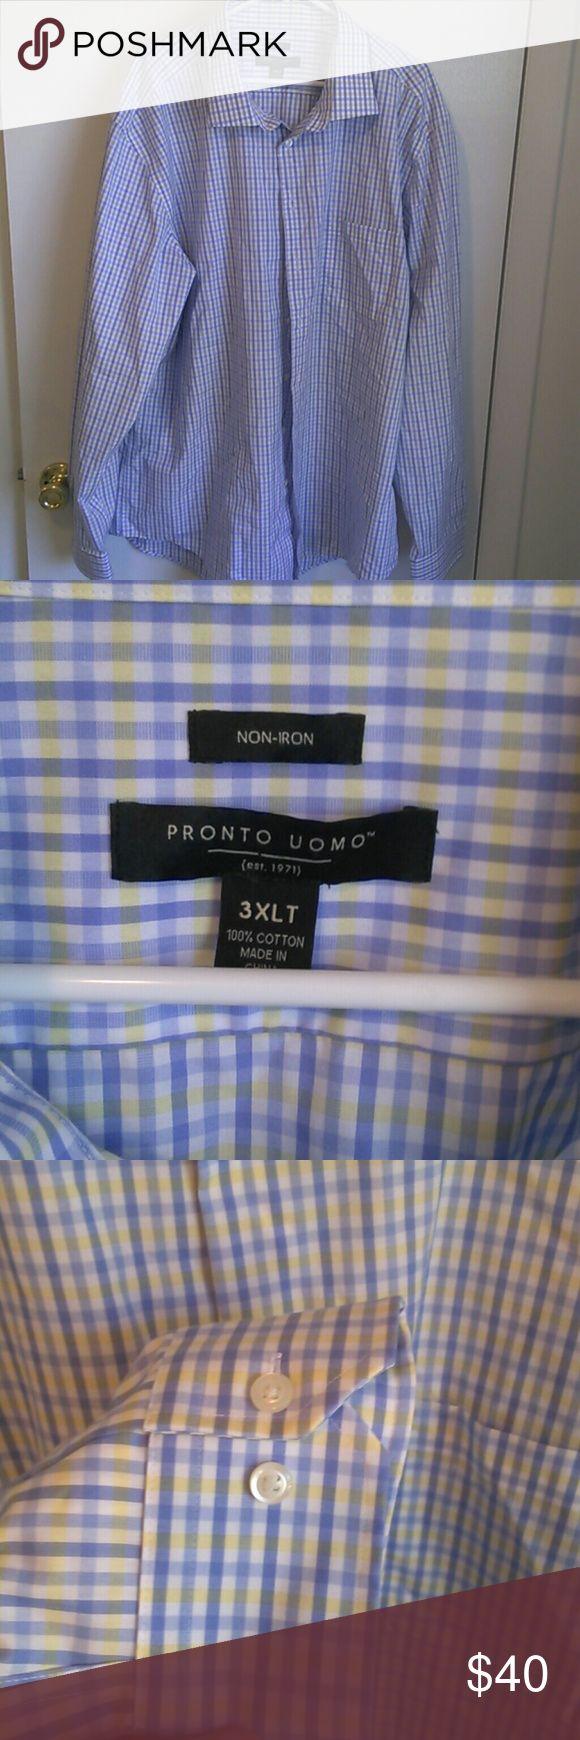 Pronto uomo 3xlt non iron dress shirt Fits like a 3xl Shirts